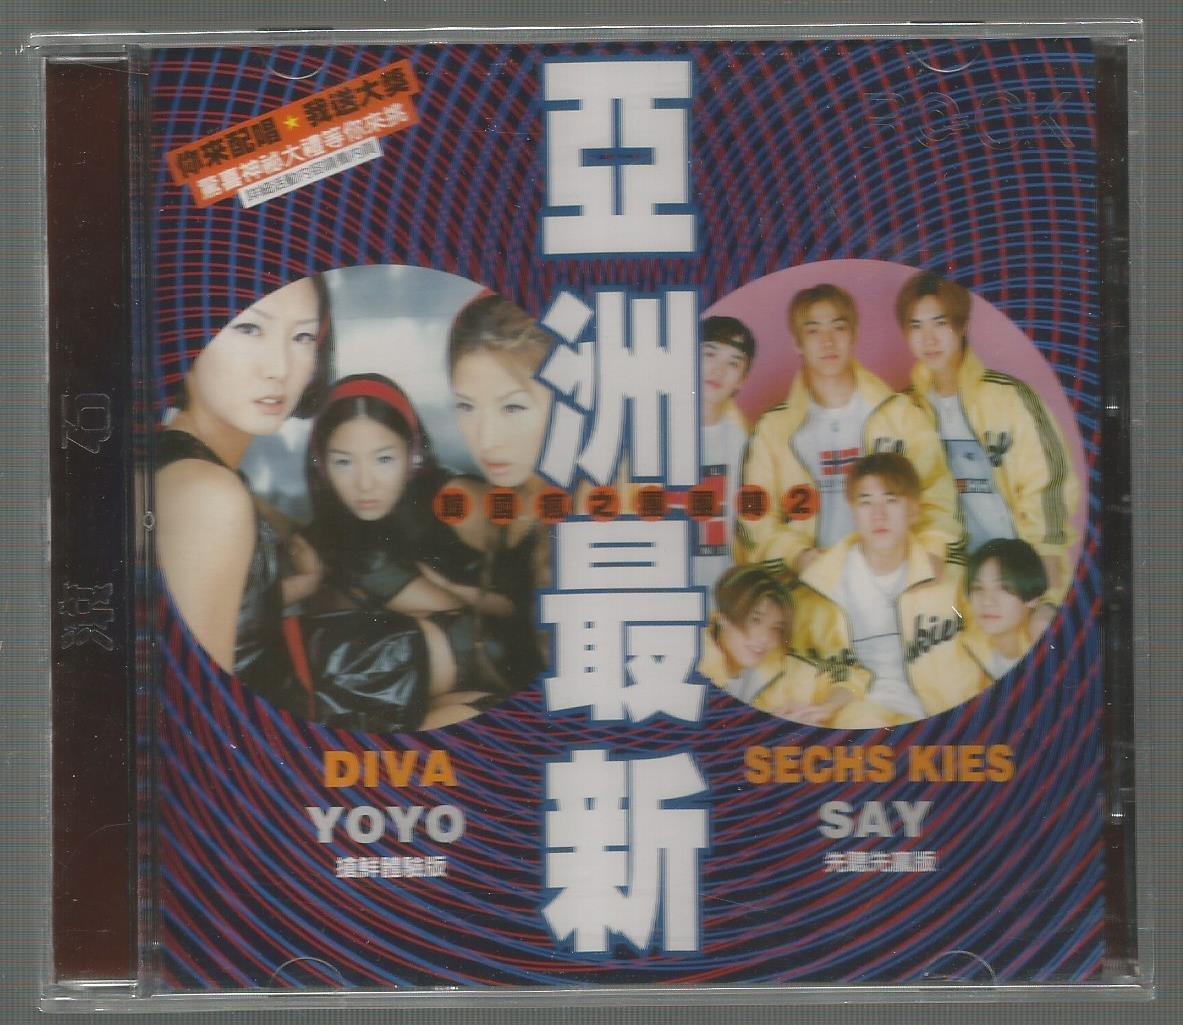 亞洲最新--韓國瘋之團團轉 2 [DIVE-YOYO+SECHS KIES SAY ] 單曲CD未拆封